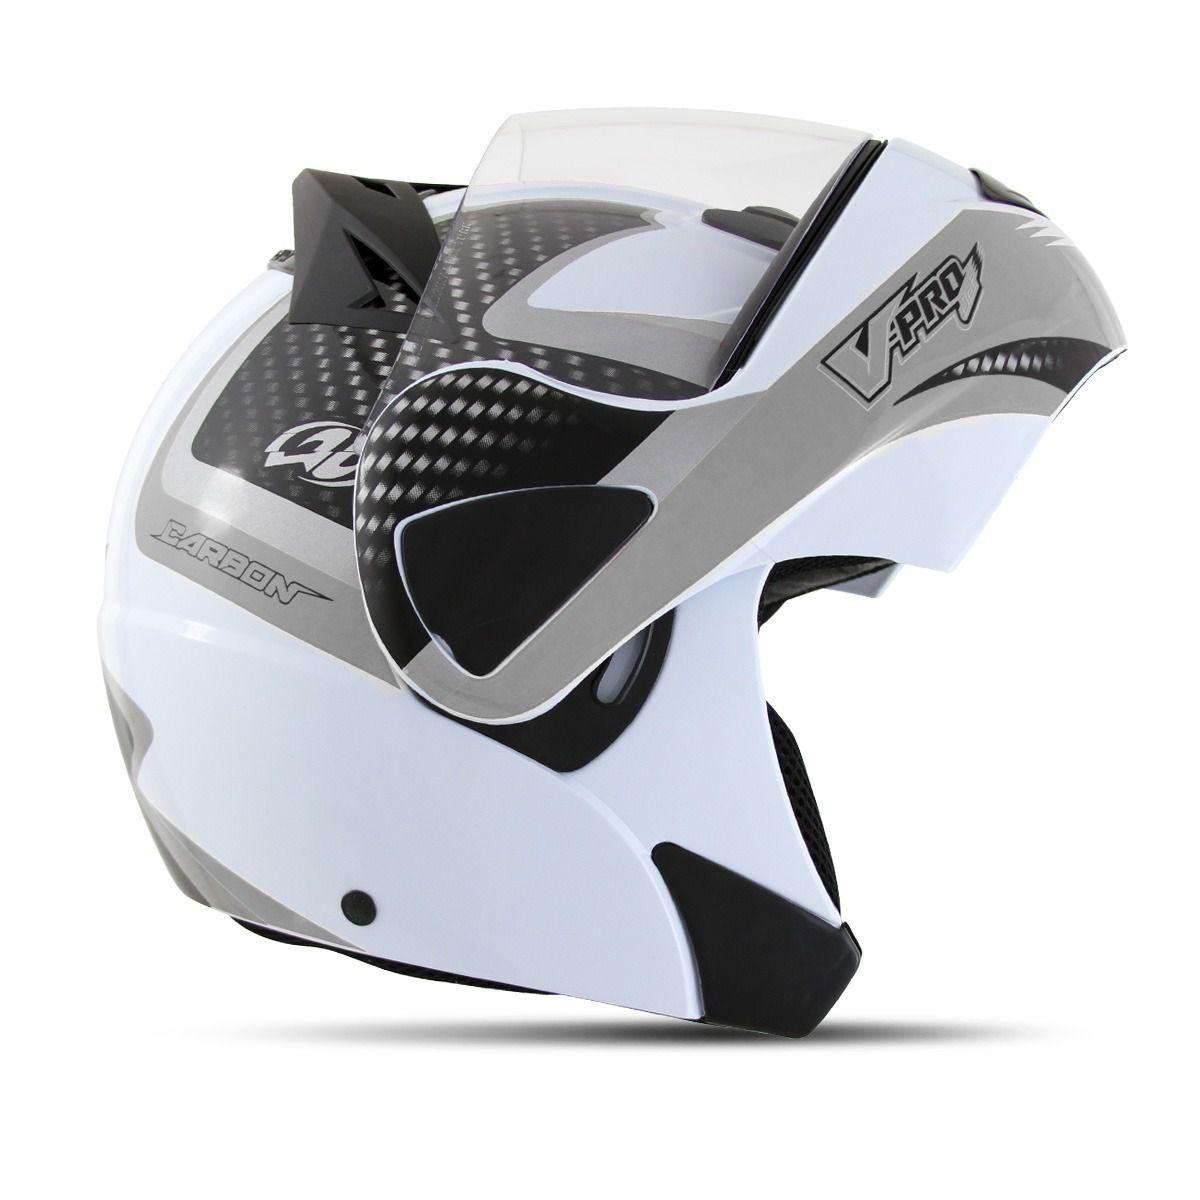 Capacete Moto VPro Jet 2 Escamotiavel Carbon Branco Motocicleta Acessorios (VPRO JET2)